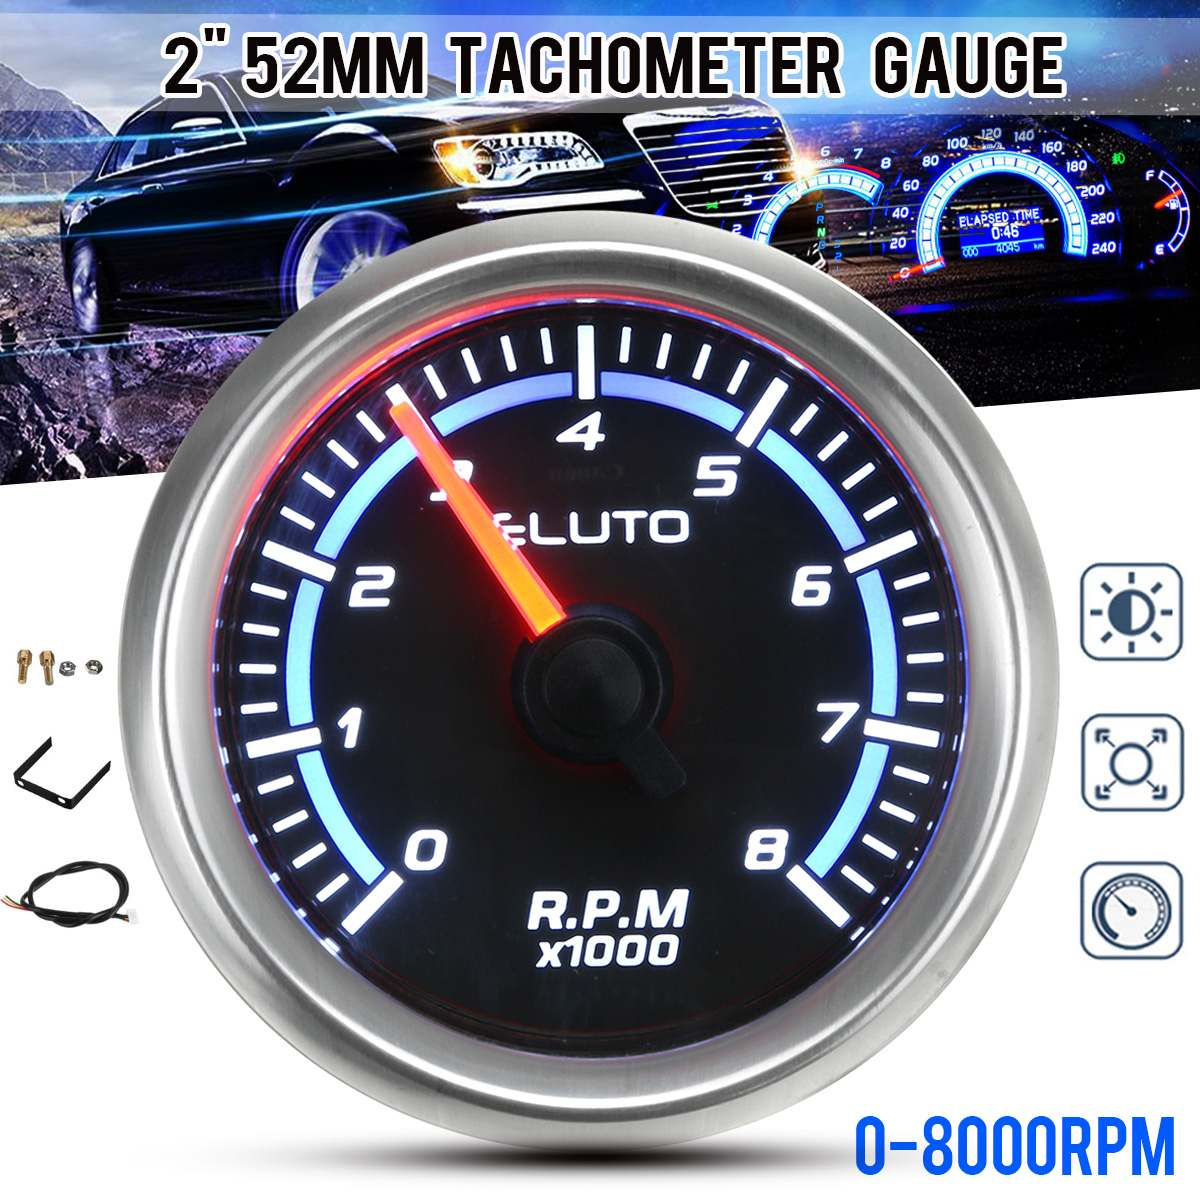 Car RPM Tachometer Gauge 0-8000 RPM Blue LED Display Universal 12V 2